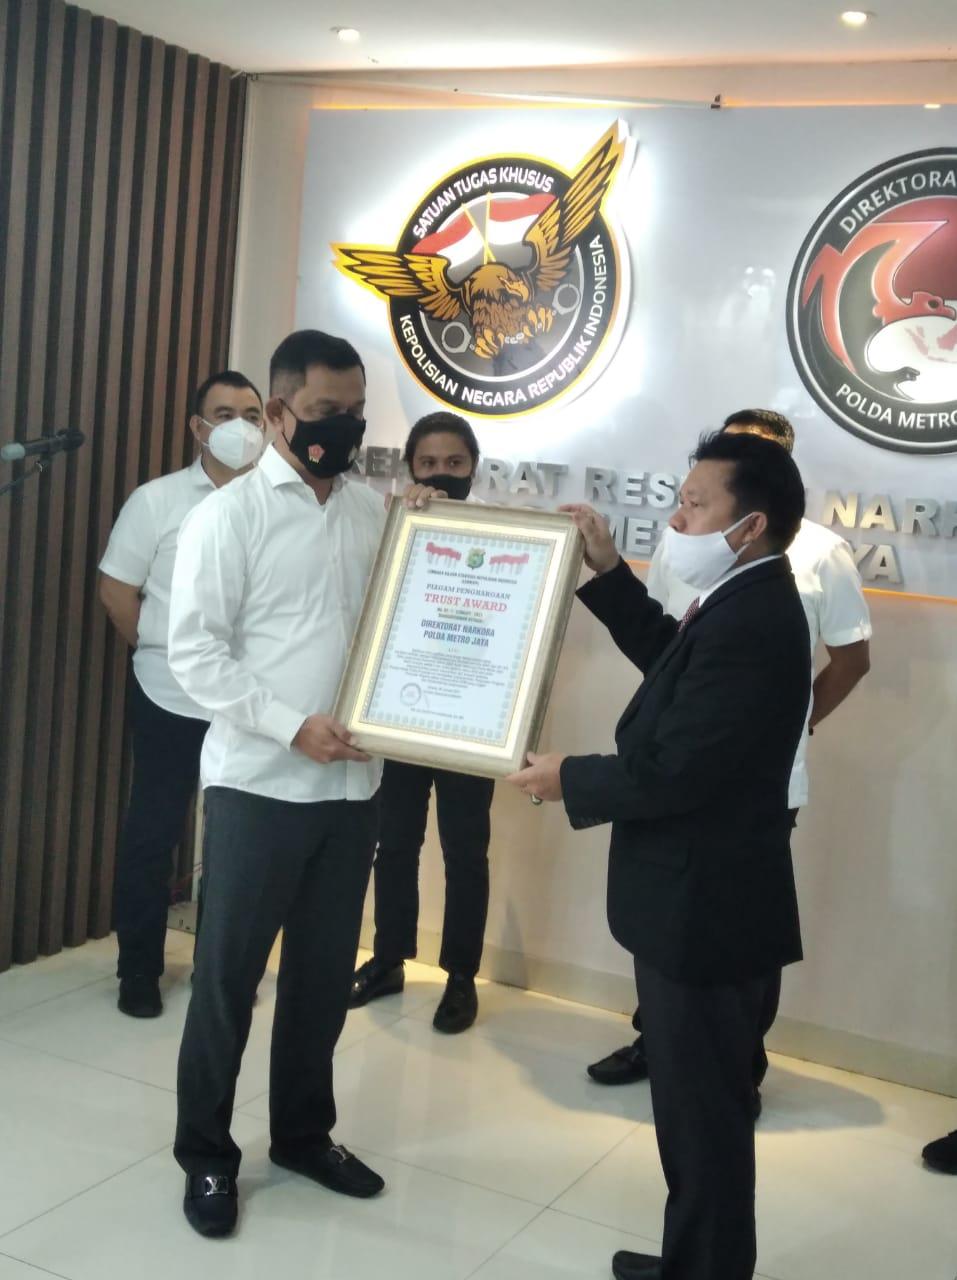 LEMPKAPI Apresiasi Kinerja Direktorat Reserse Narkoba Polda Metro Jaya Beri Penghargaan Trust Award